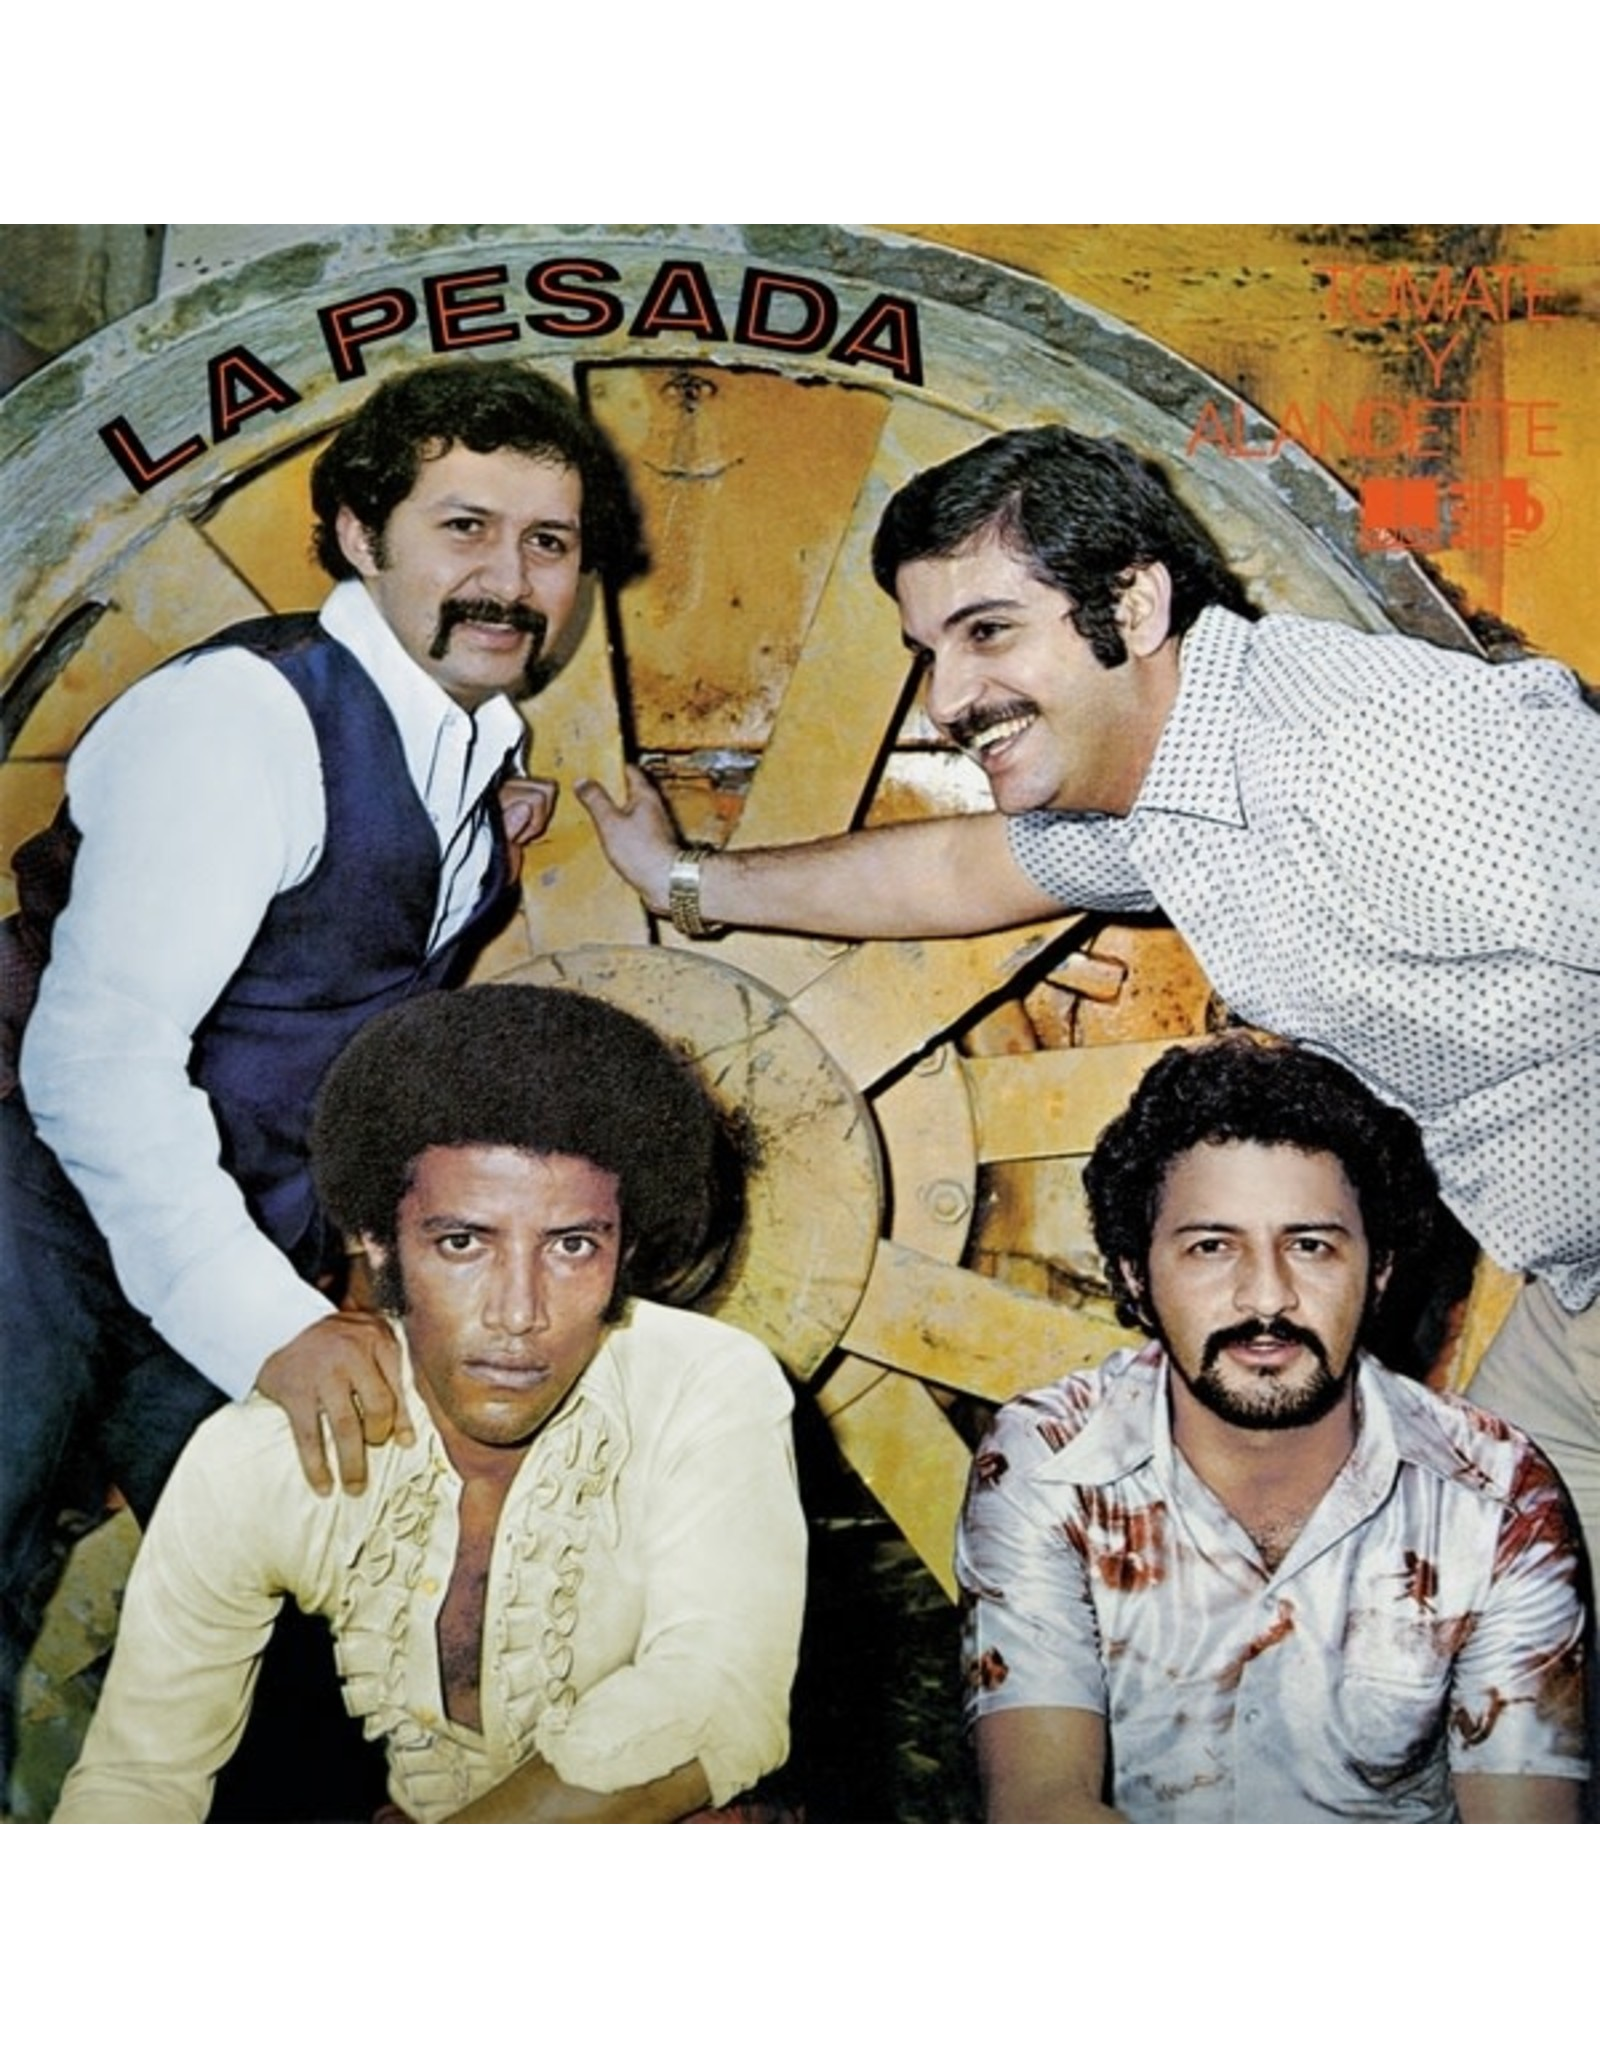 New Vinyl La Pesada - Tomate Y Alandette LP